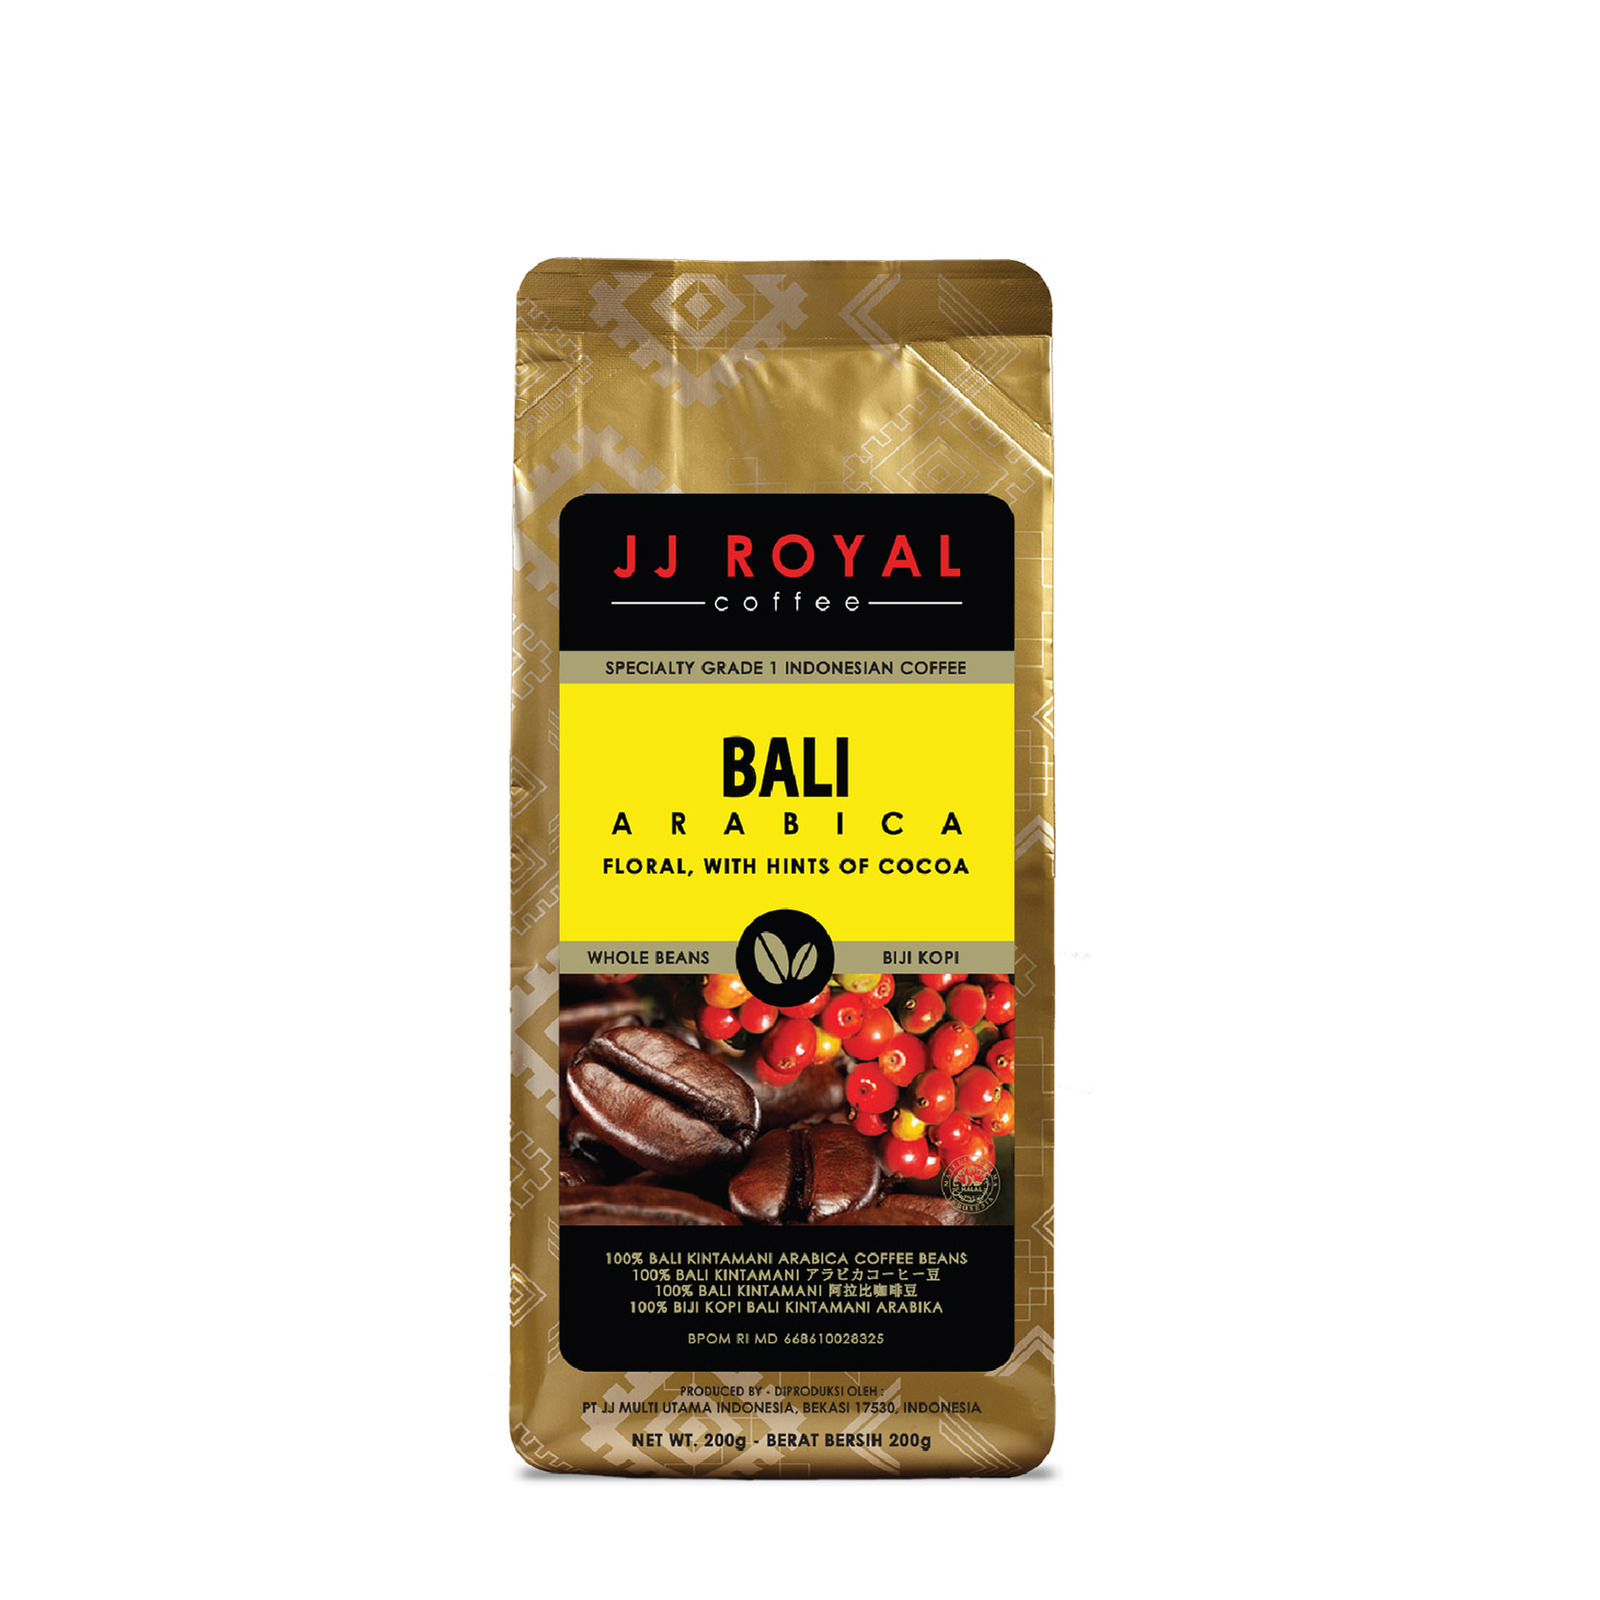 JJ Royal Coffee Bali 100% Arabica (Bean)